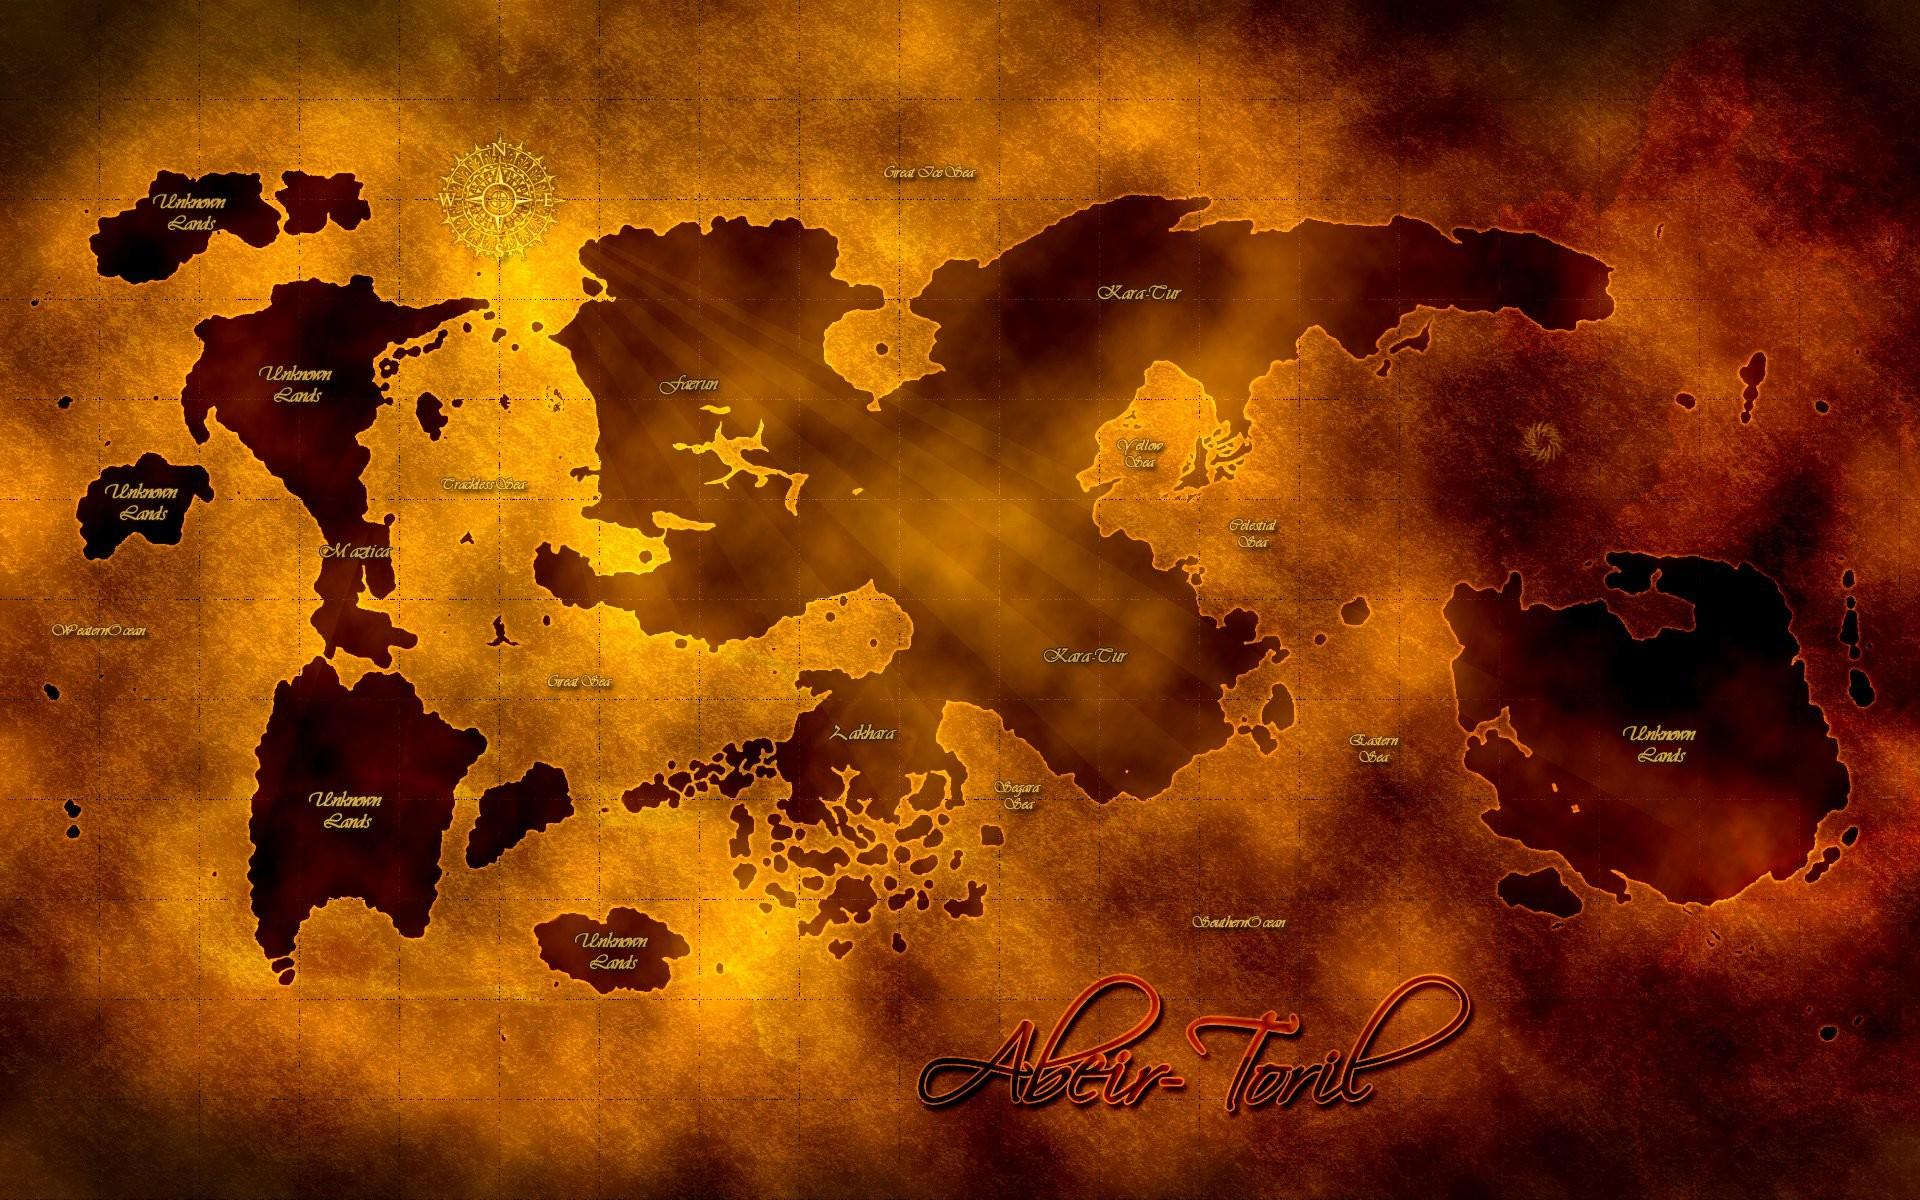 The Map of the Planet Abeir-Toril Wallpaper | Faerûn | Pinterest | Forgotten  realms